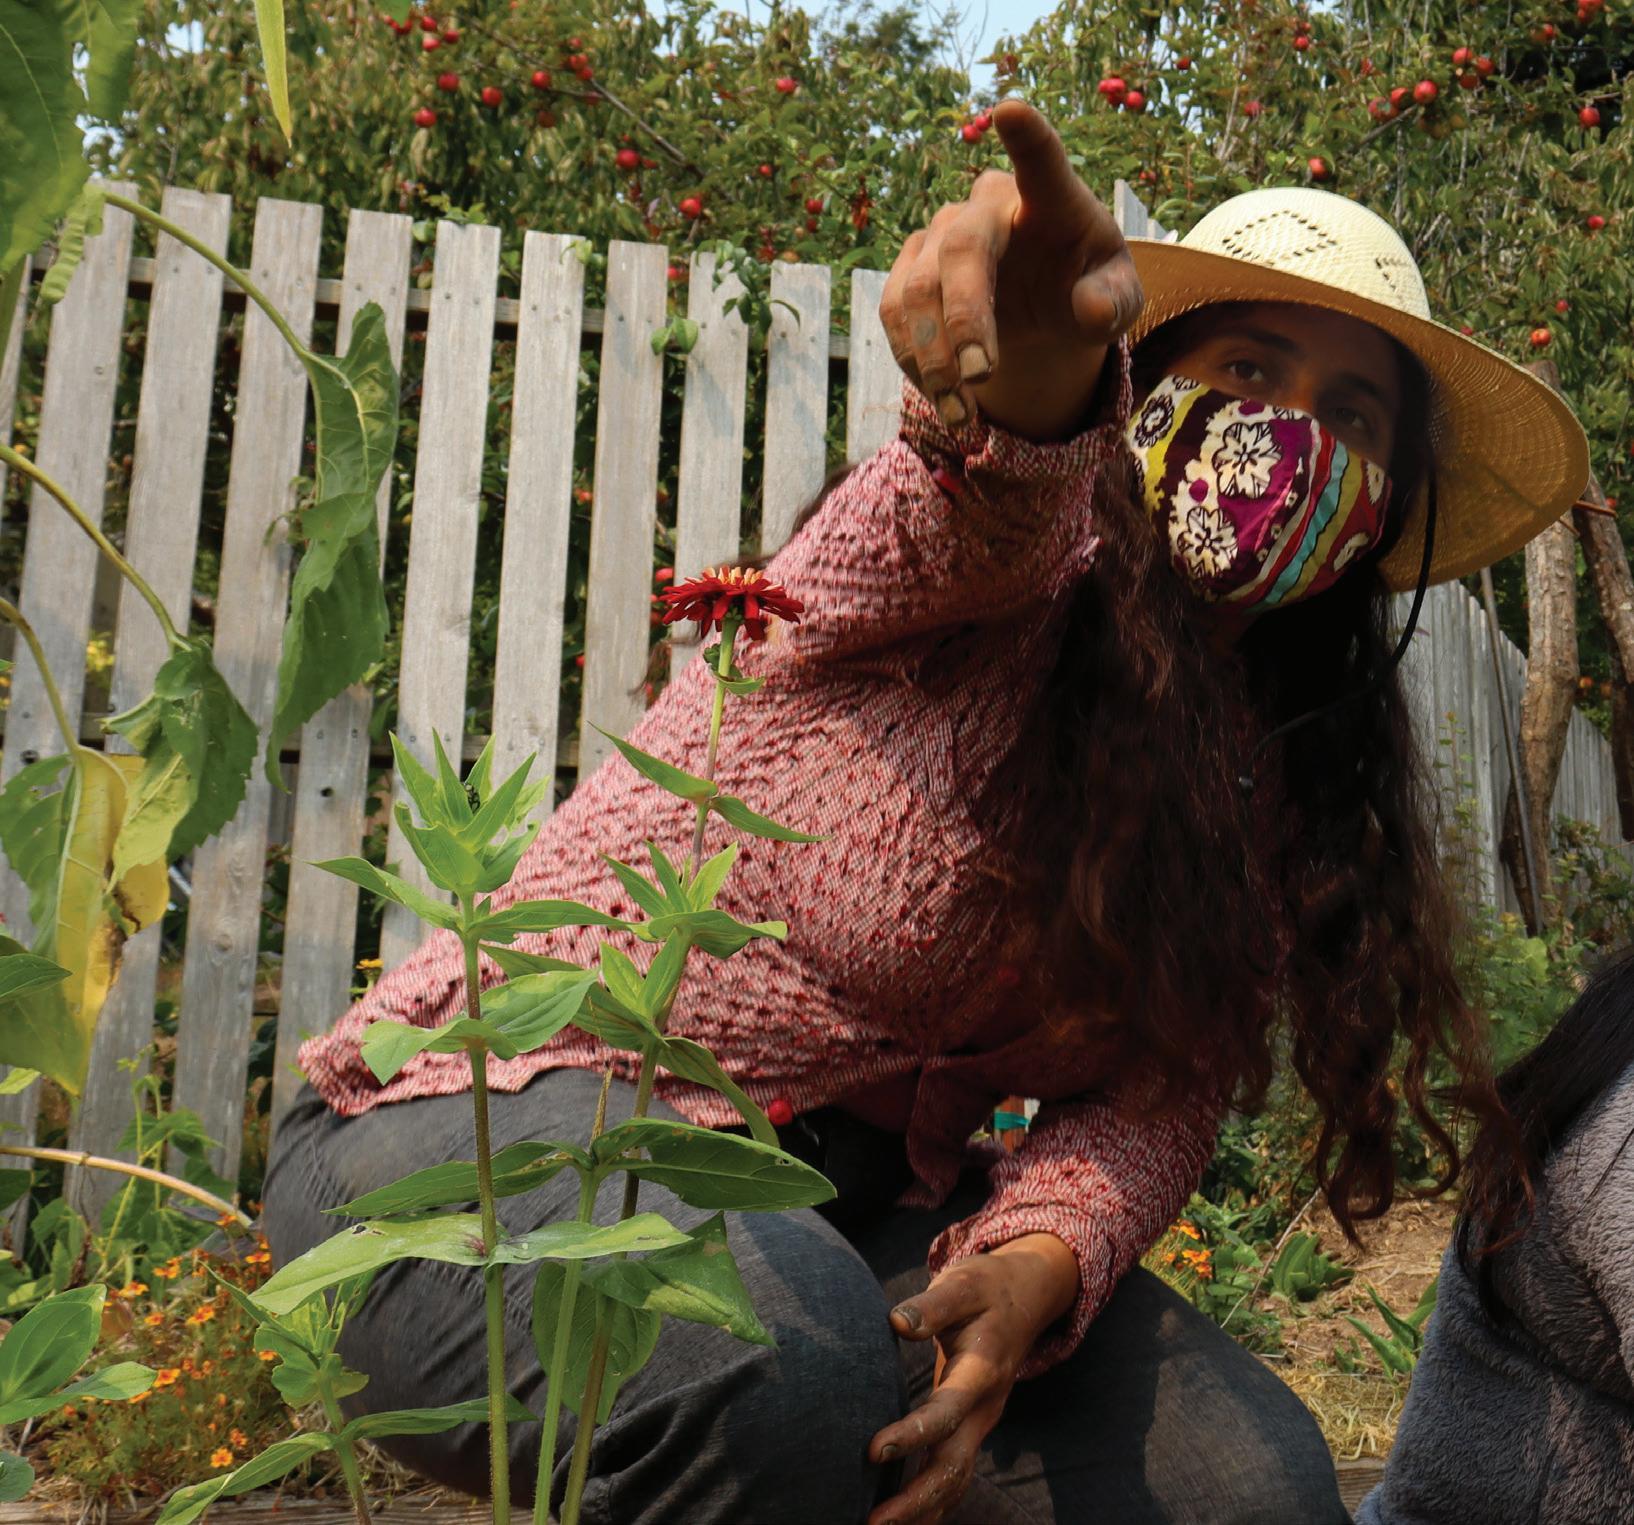 Page 14 of Jardin Sanctuario creates safe space for community